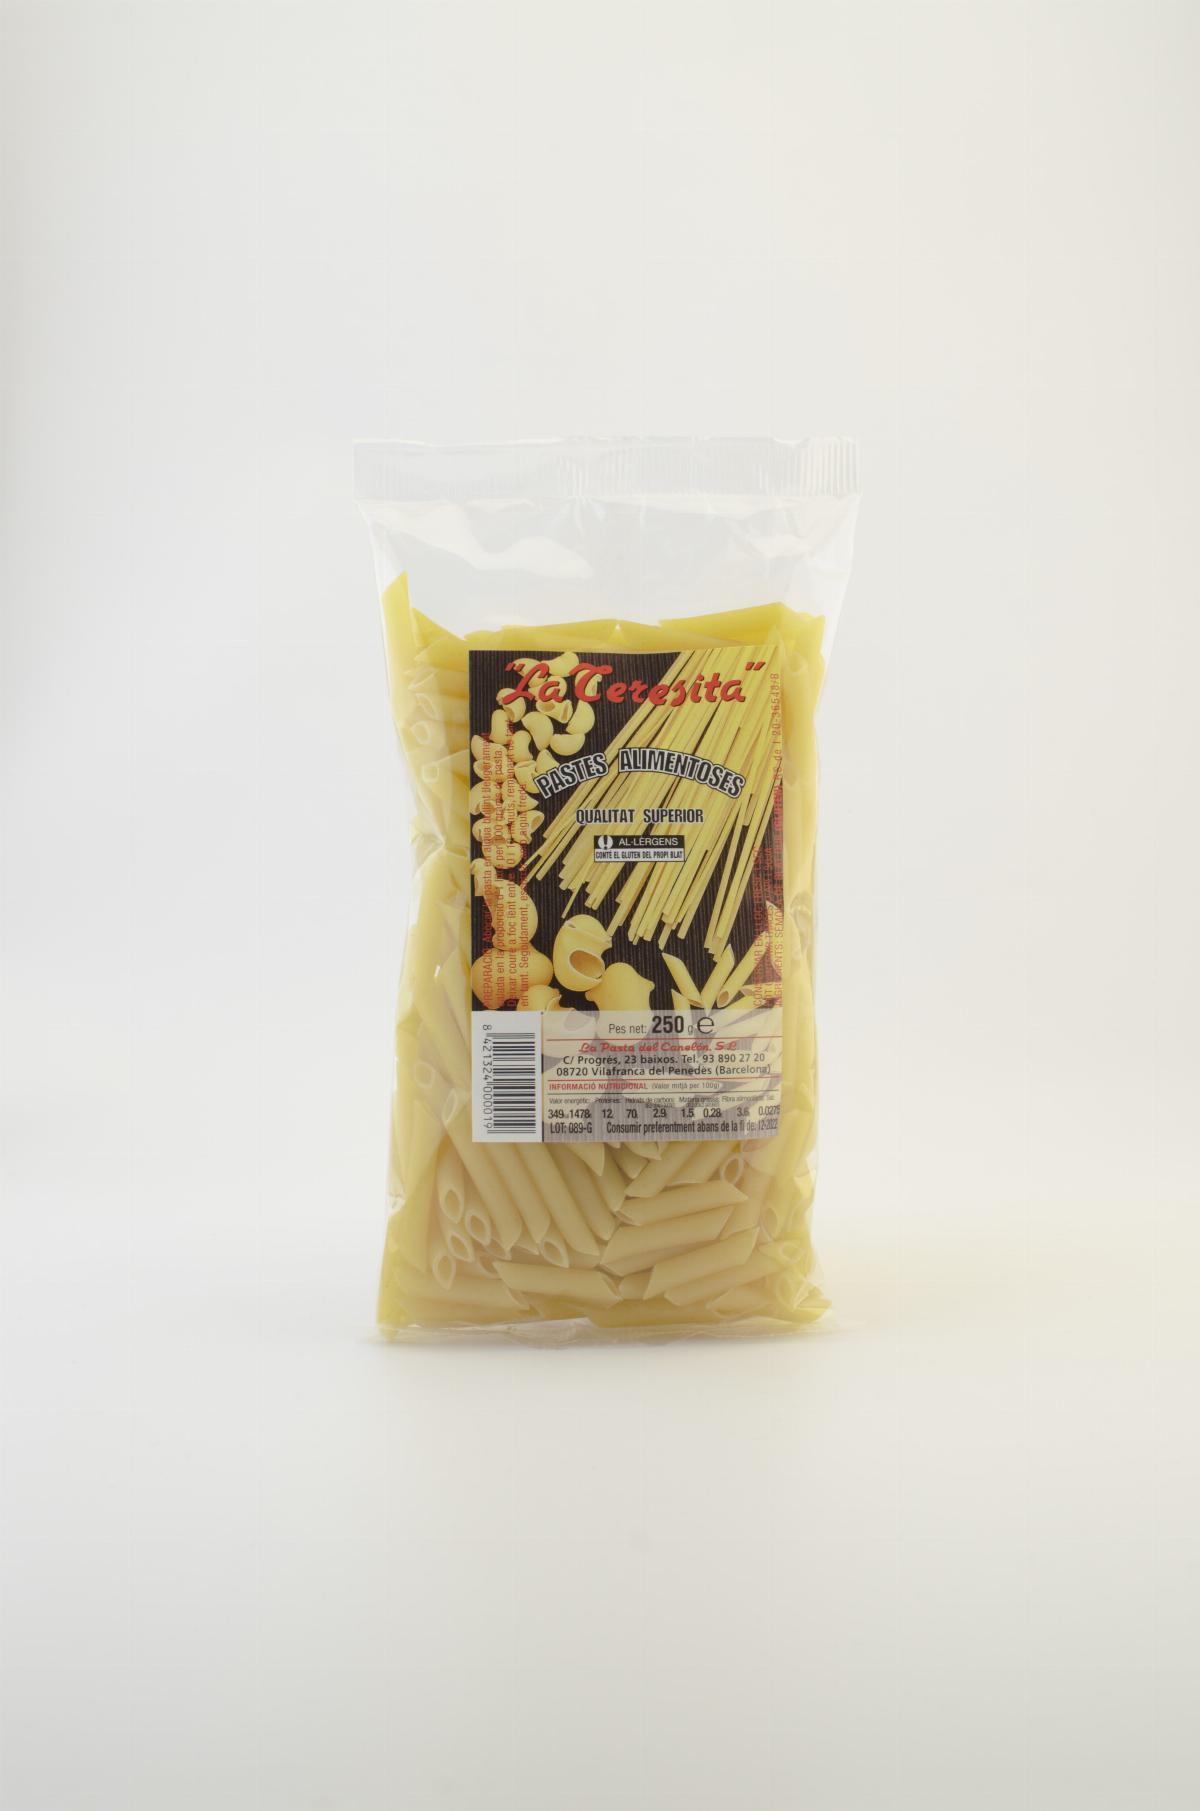 Pasta - La Teresita Traditional Pasta Penne 250g - Mestral Cambrils